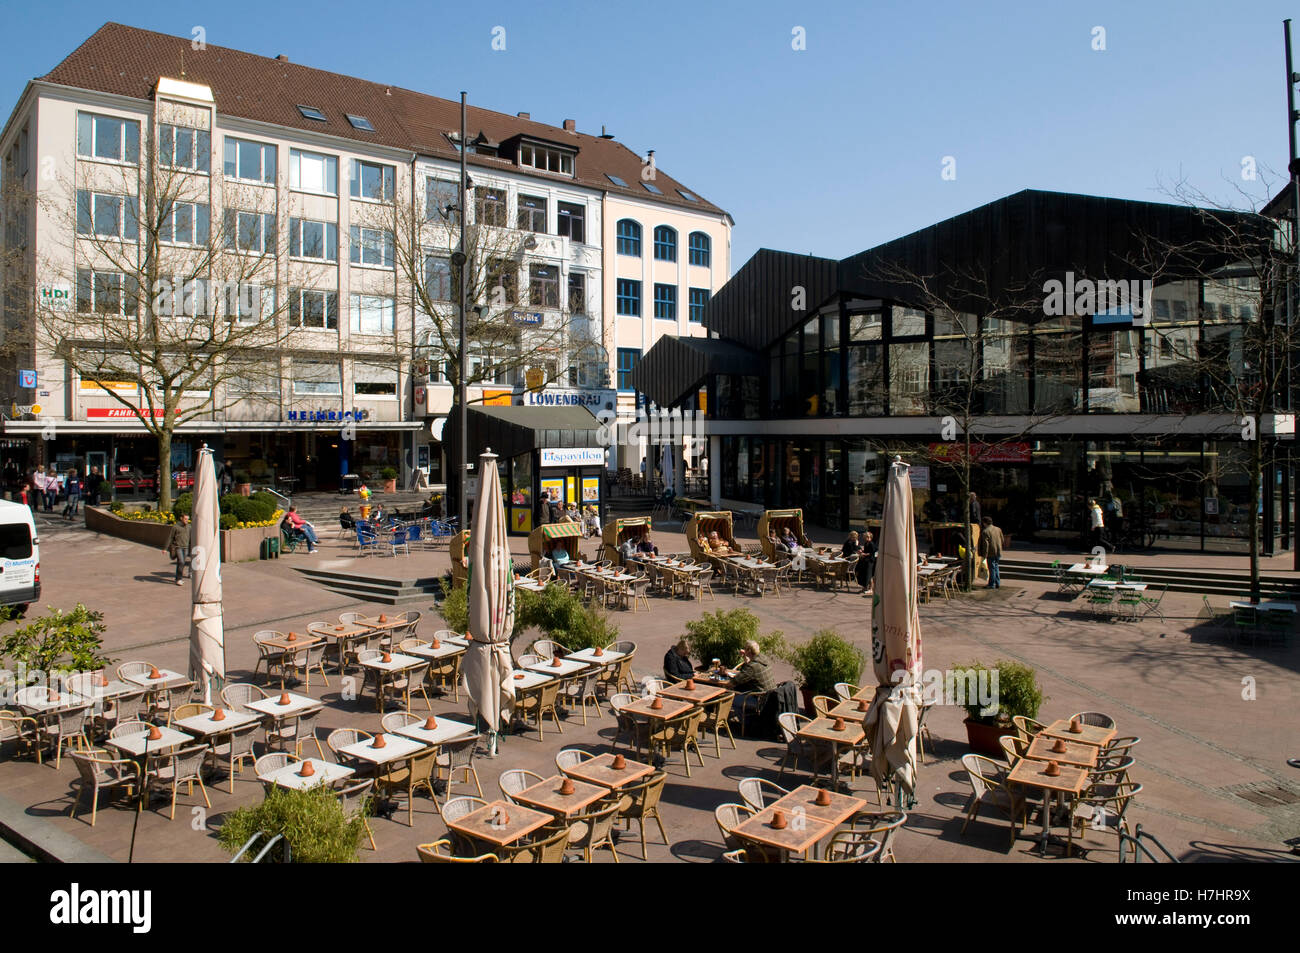 alter markt square state capital of kiel schleswig holstein stock photo 125166662 alamy. Black Bedroom Furniture Sets. Home Design Ideas